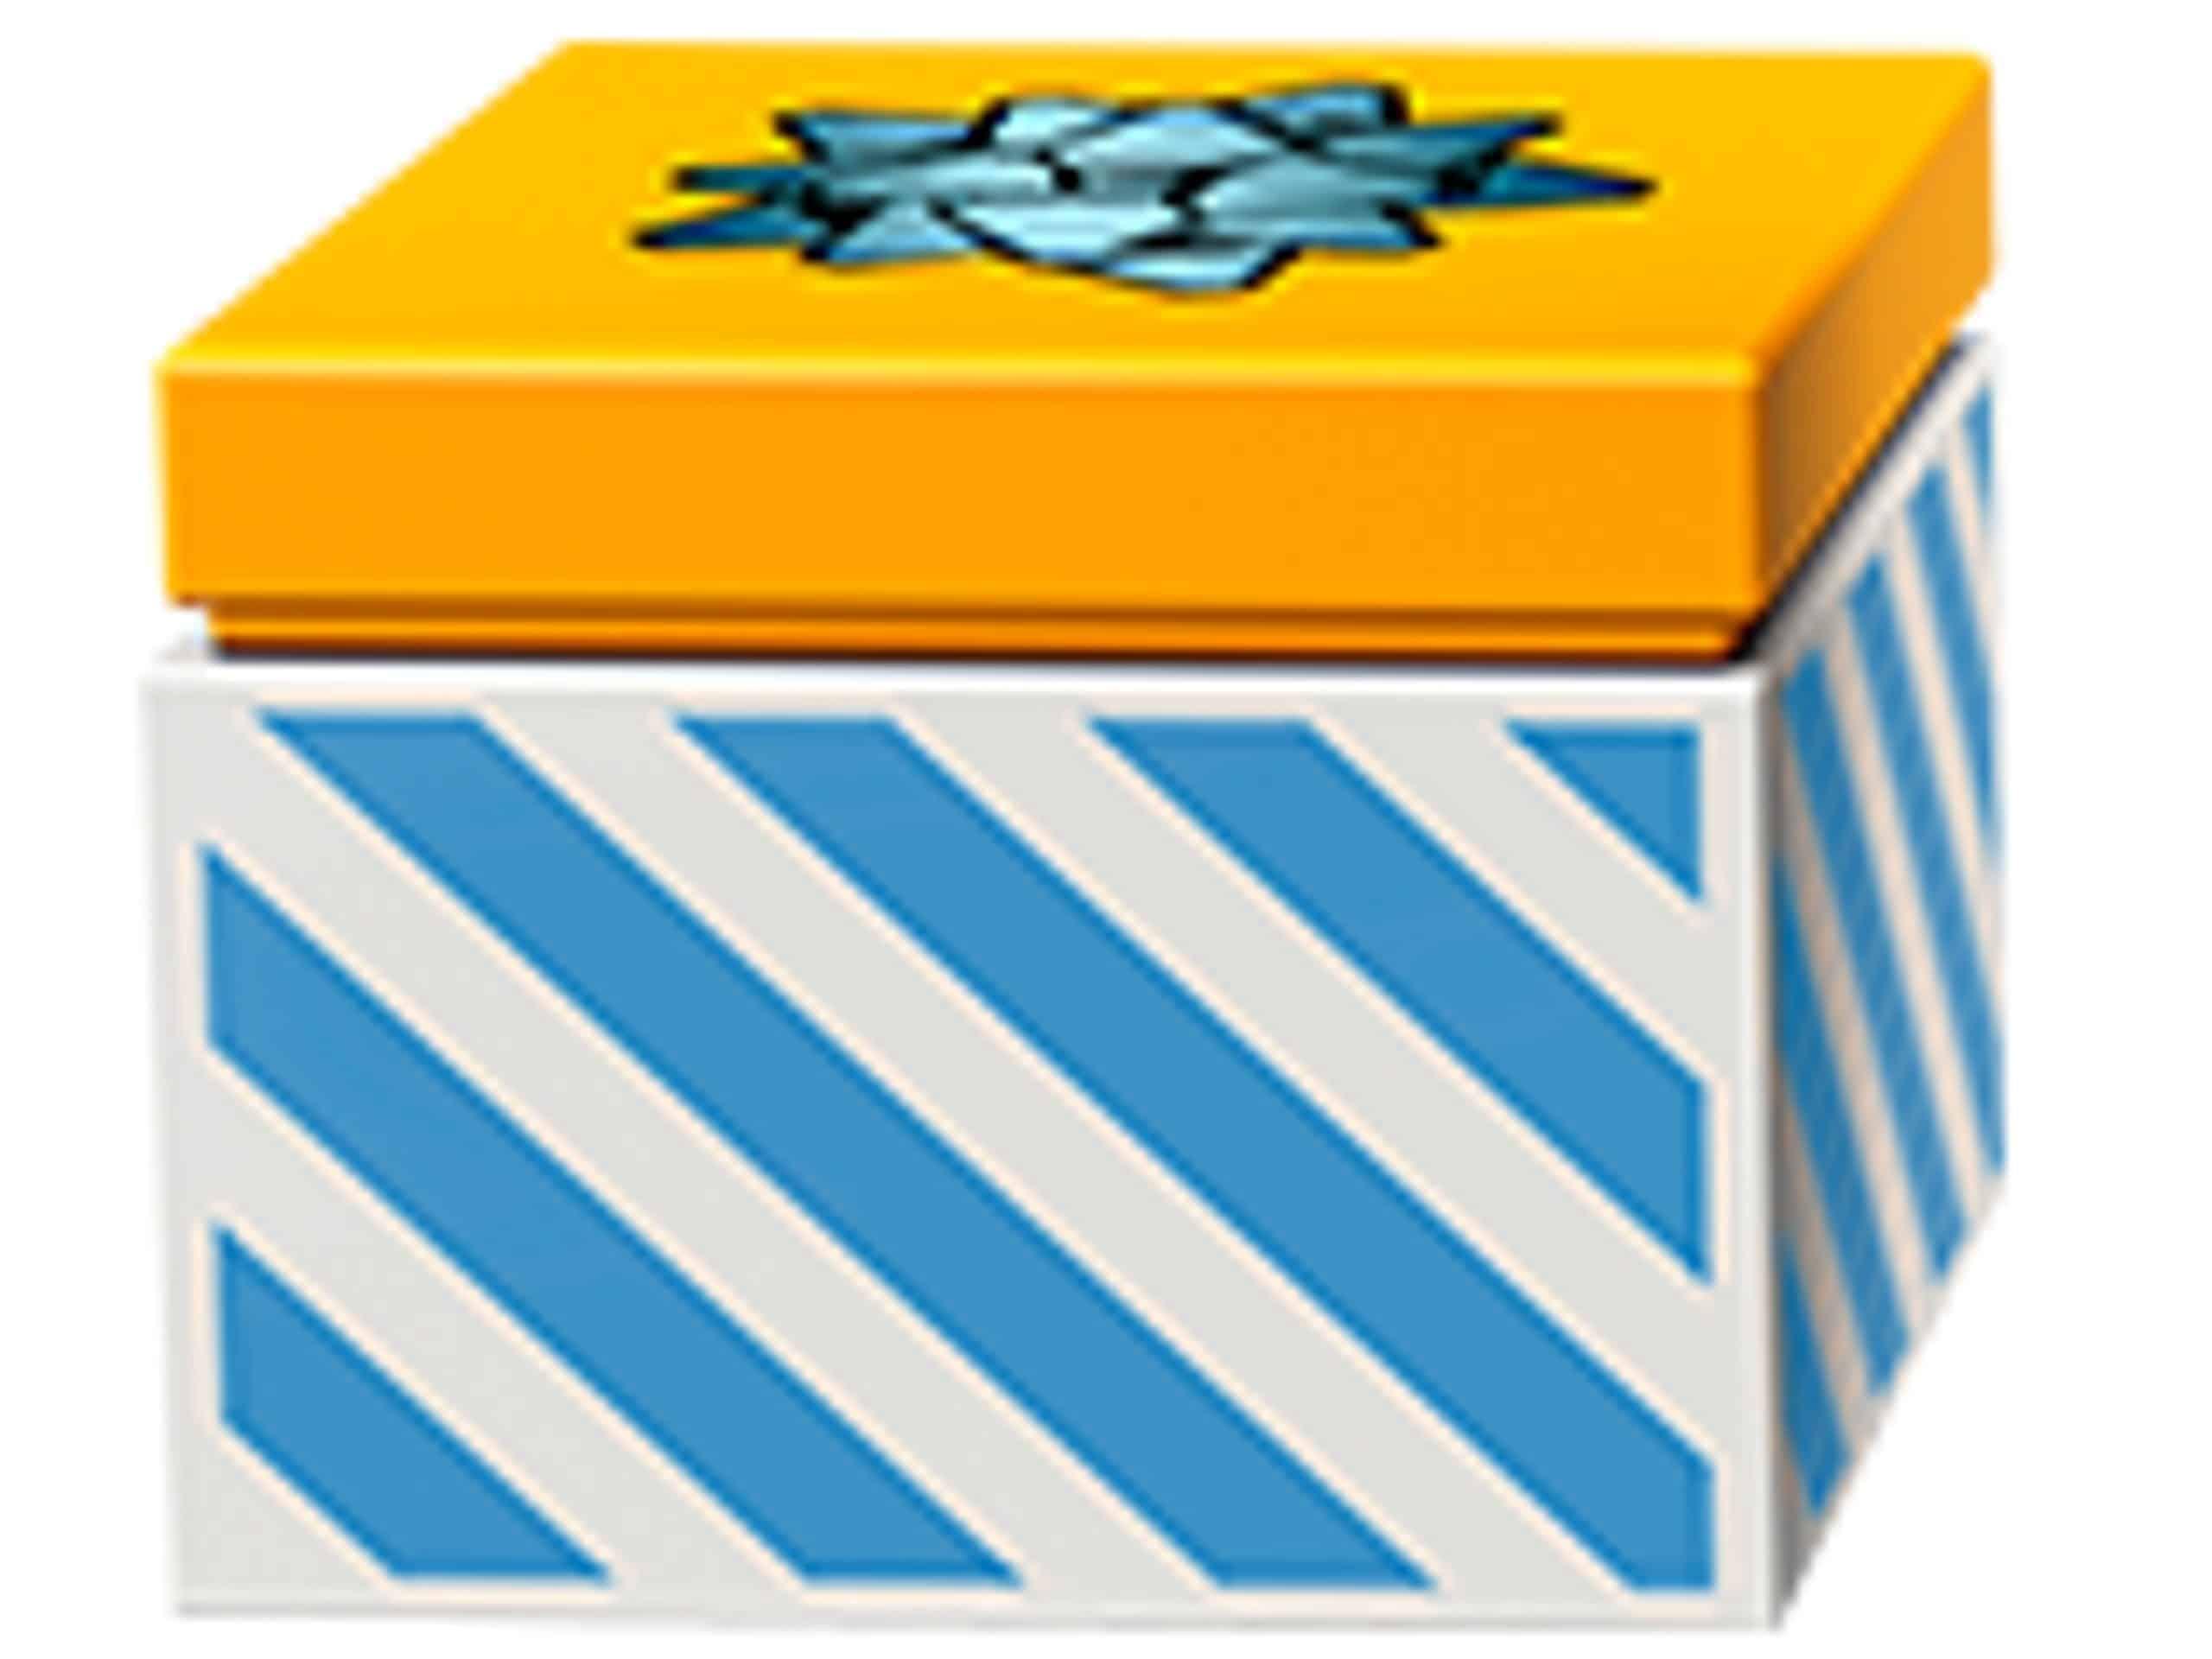 5006351 offiziellen lego 5006351 shop at scaled